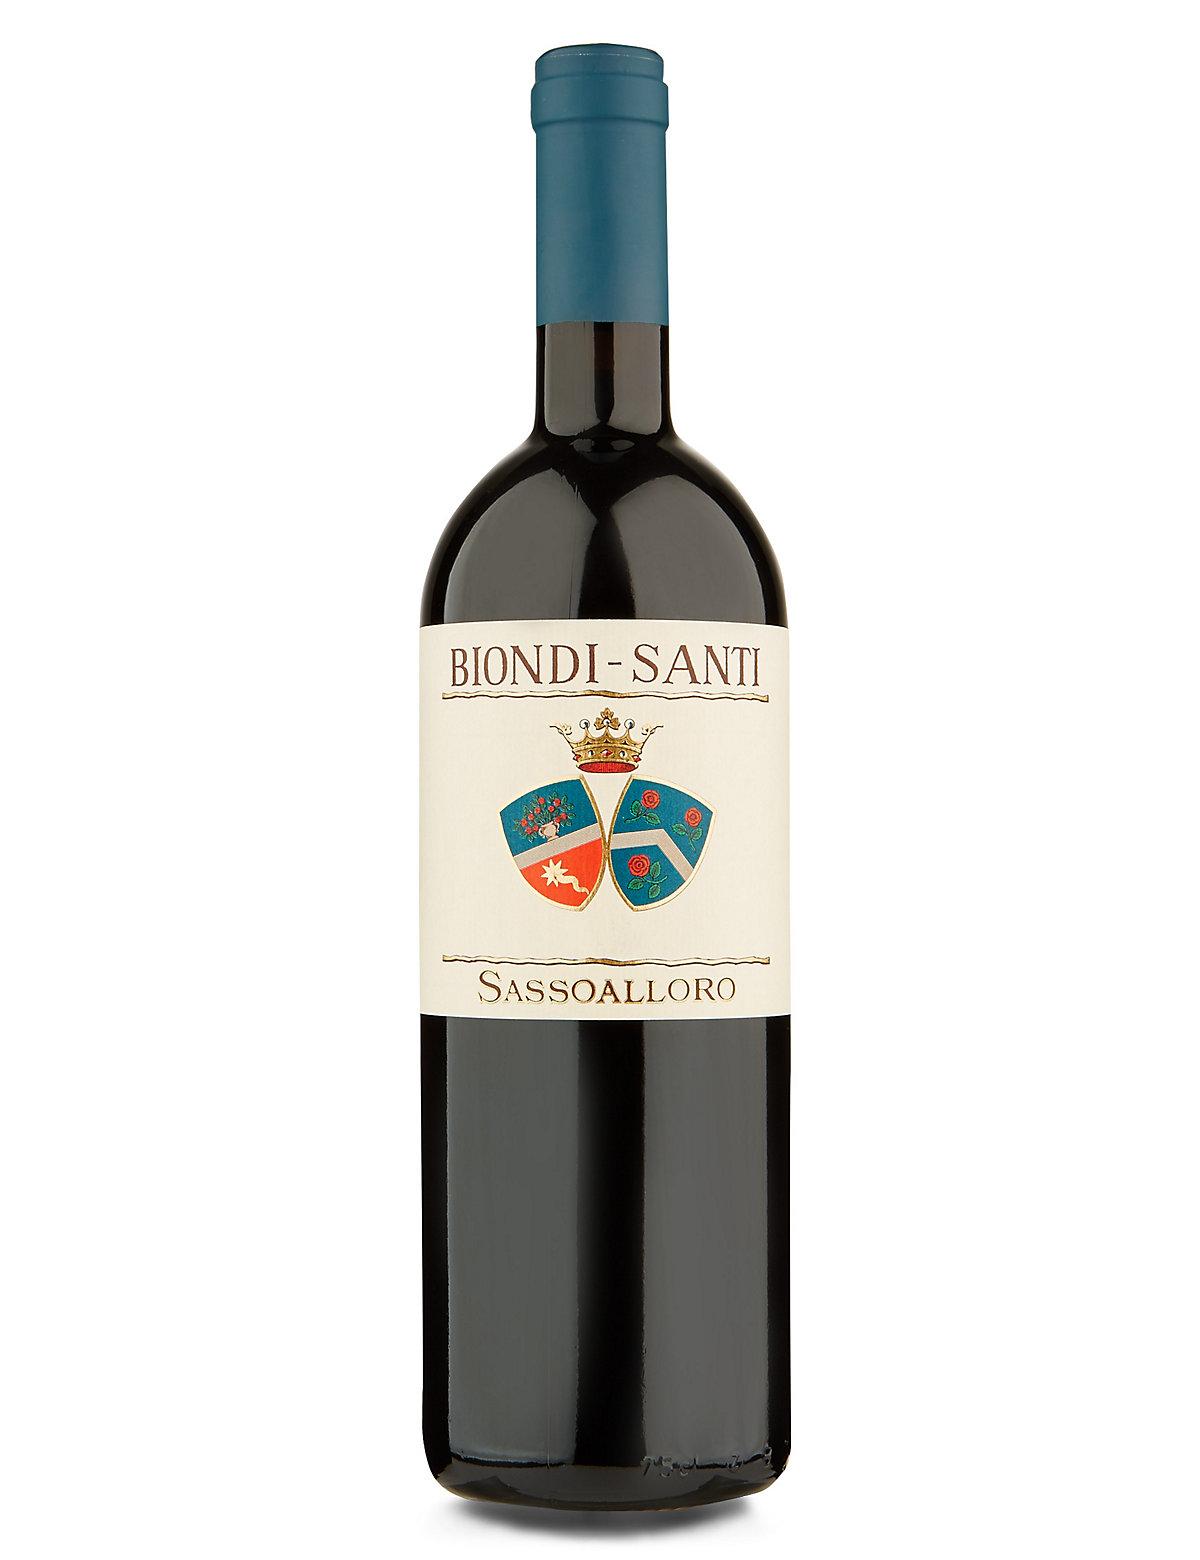 Biondi Santi Castello di Montepo Sassoalloro - Single Bottle